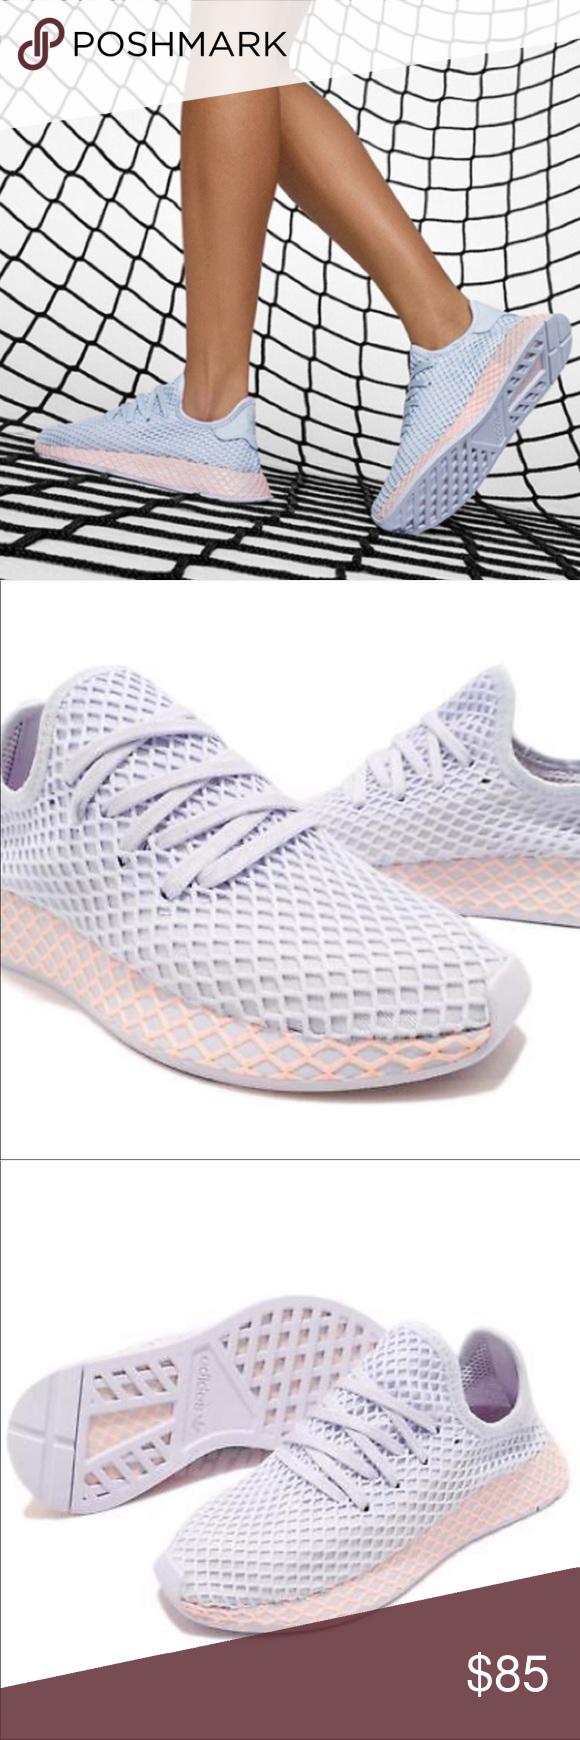 a02f0e8e1f67b •Adidas• Deerupt Runner Minimalist Women s 10.5 Brand new in original box. Adidas  Deerupt